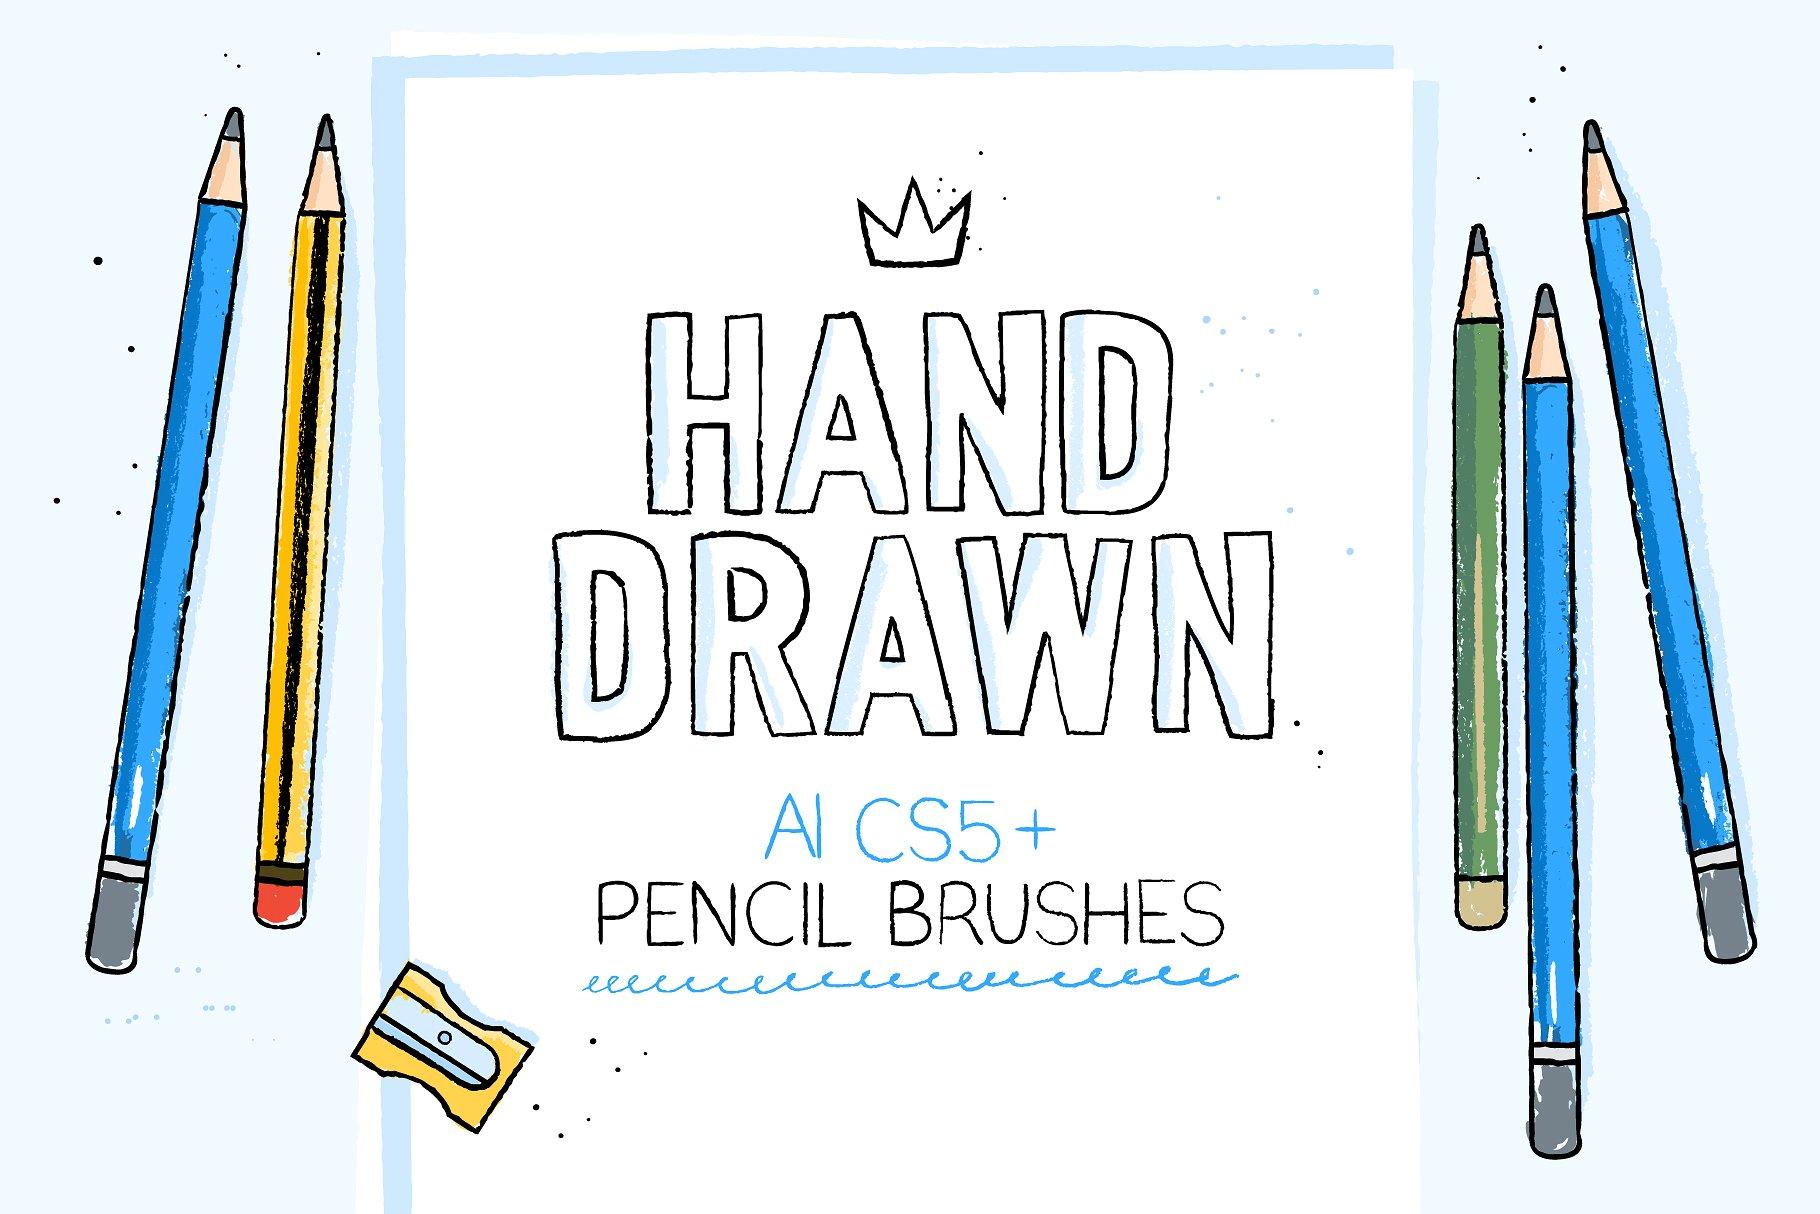 Ai手绘笔刷 Hand-drawn pencil AI brushes设计素材模板